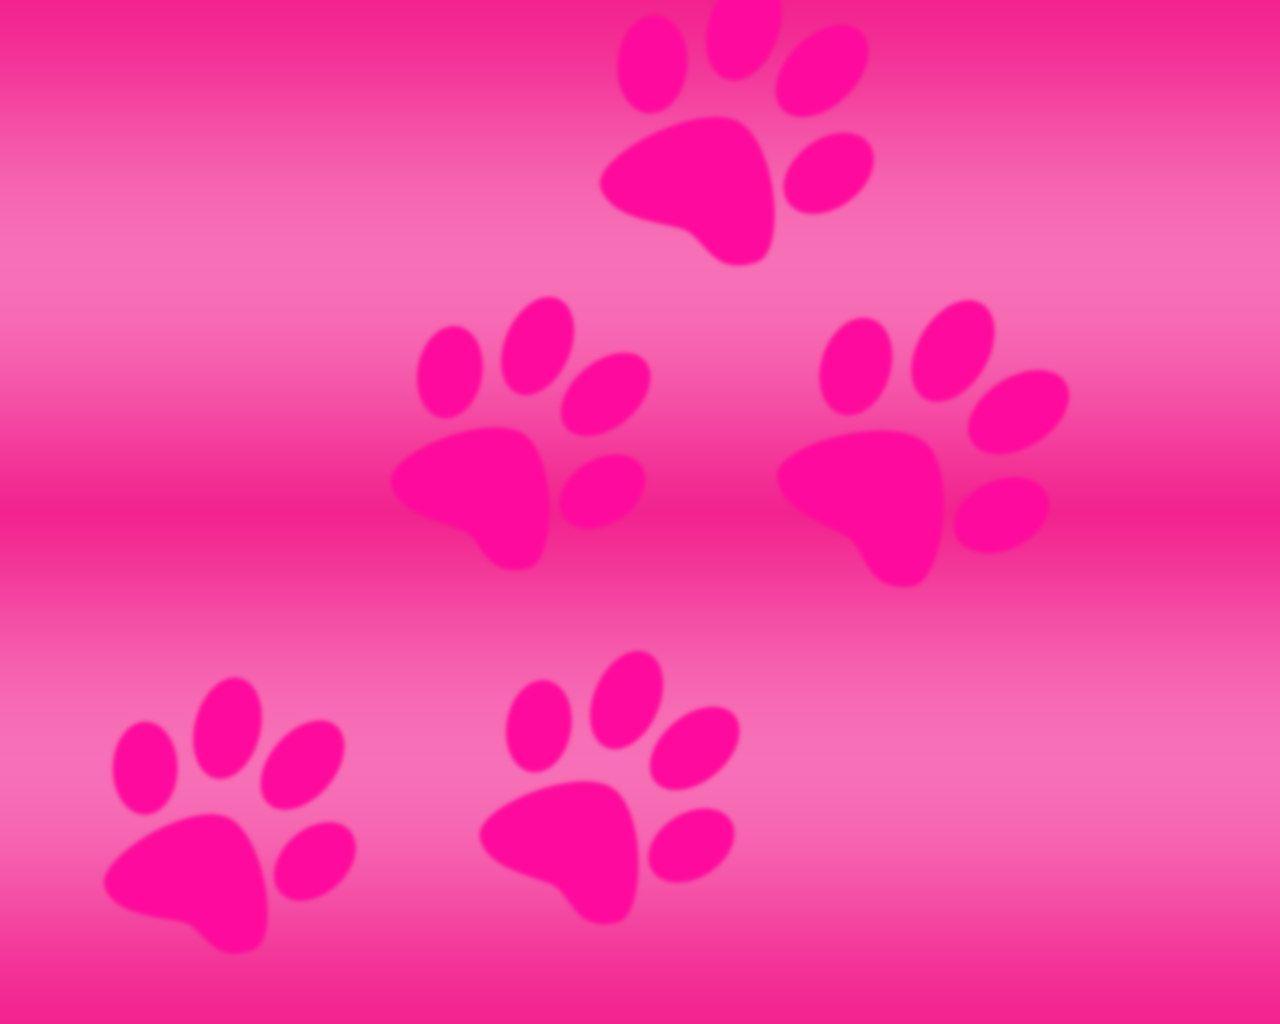 Pink Desktop Backgrounds - Wallpaper Cave